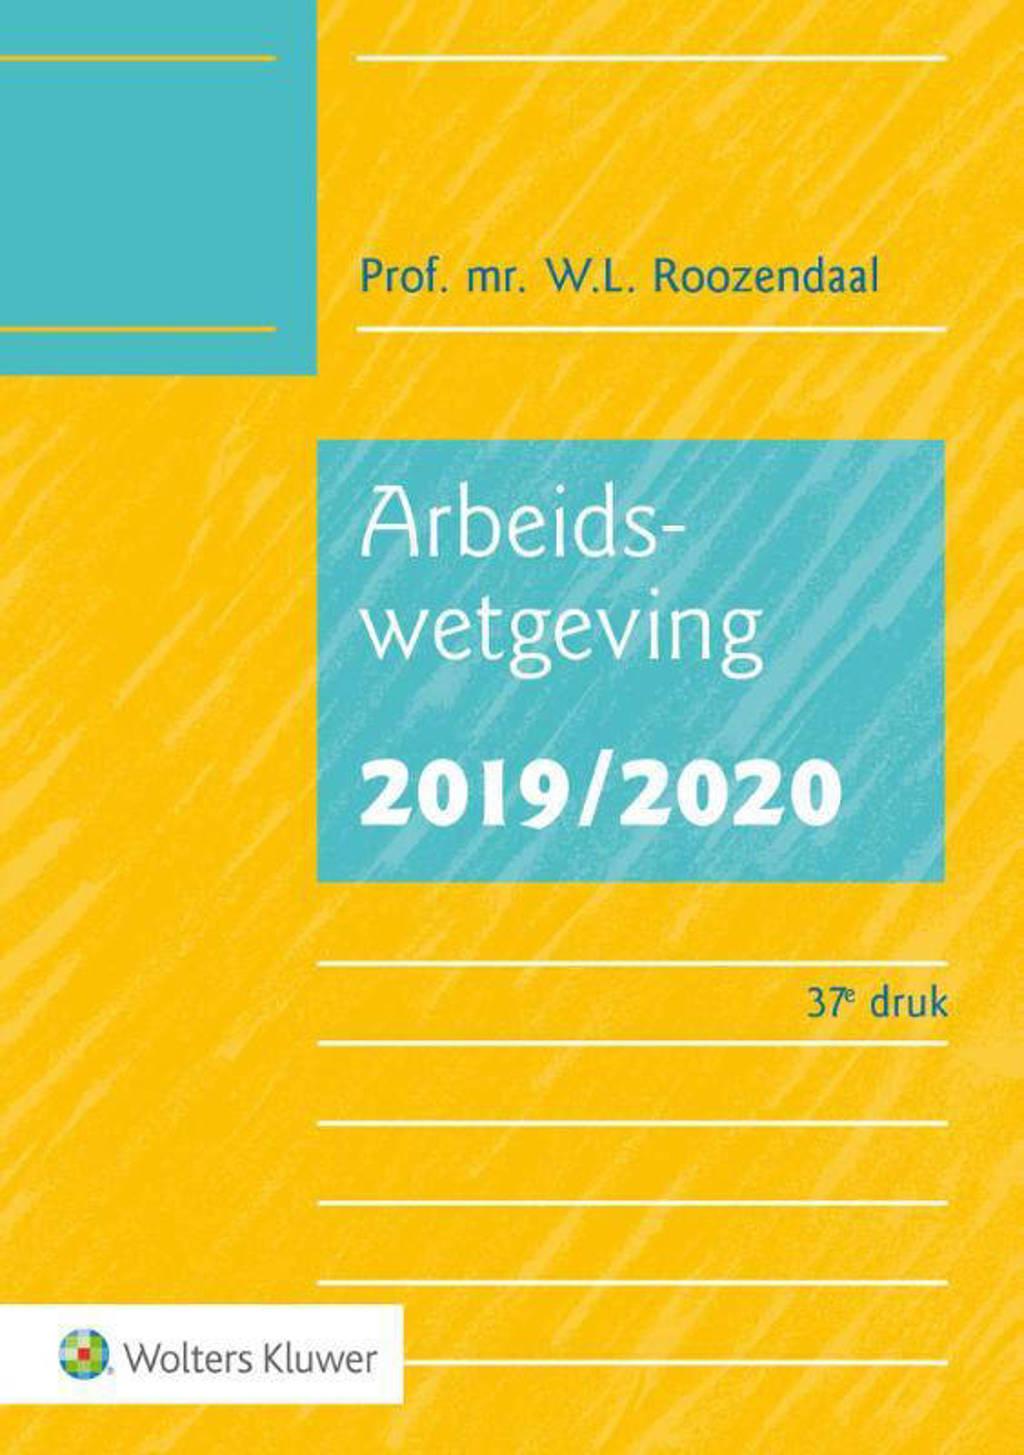 Arbeidswetgeving 2019/2020 - W.L. Roozendaal